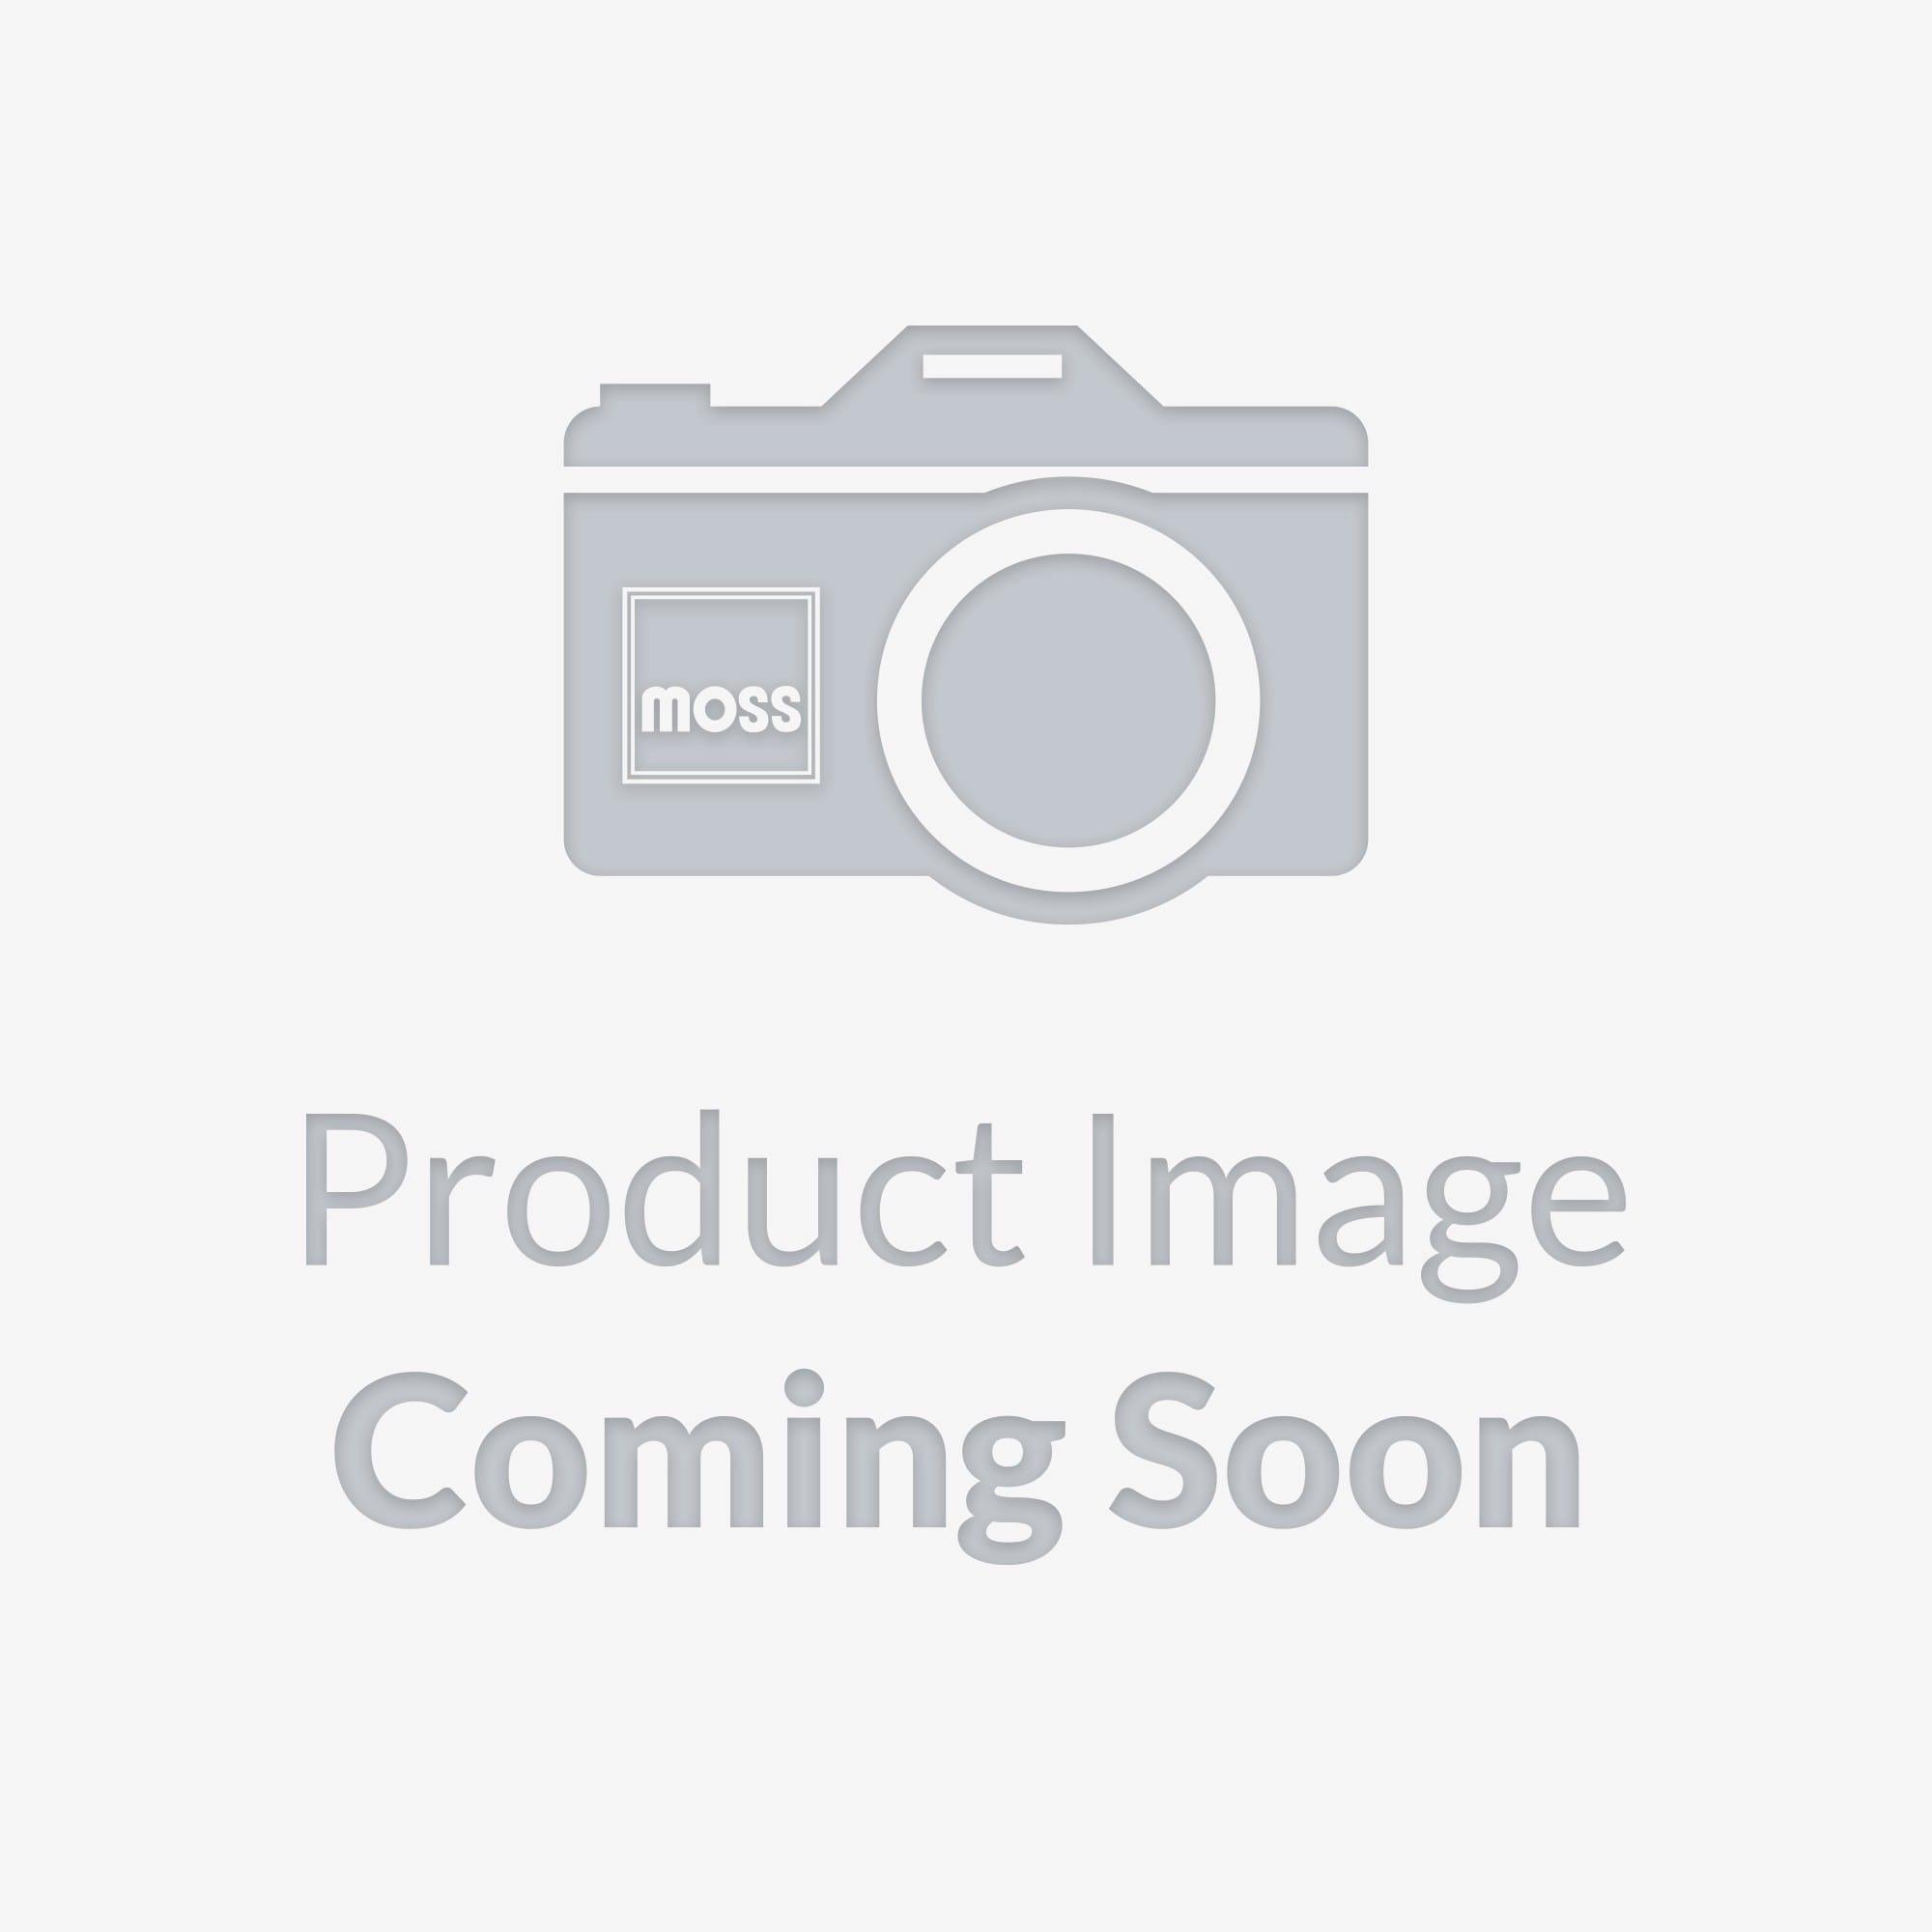 356 130 wiring harness braid pvc moss motors. Black Bedroom Furniture Sets. Home Design Ideas